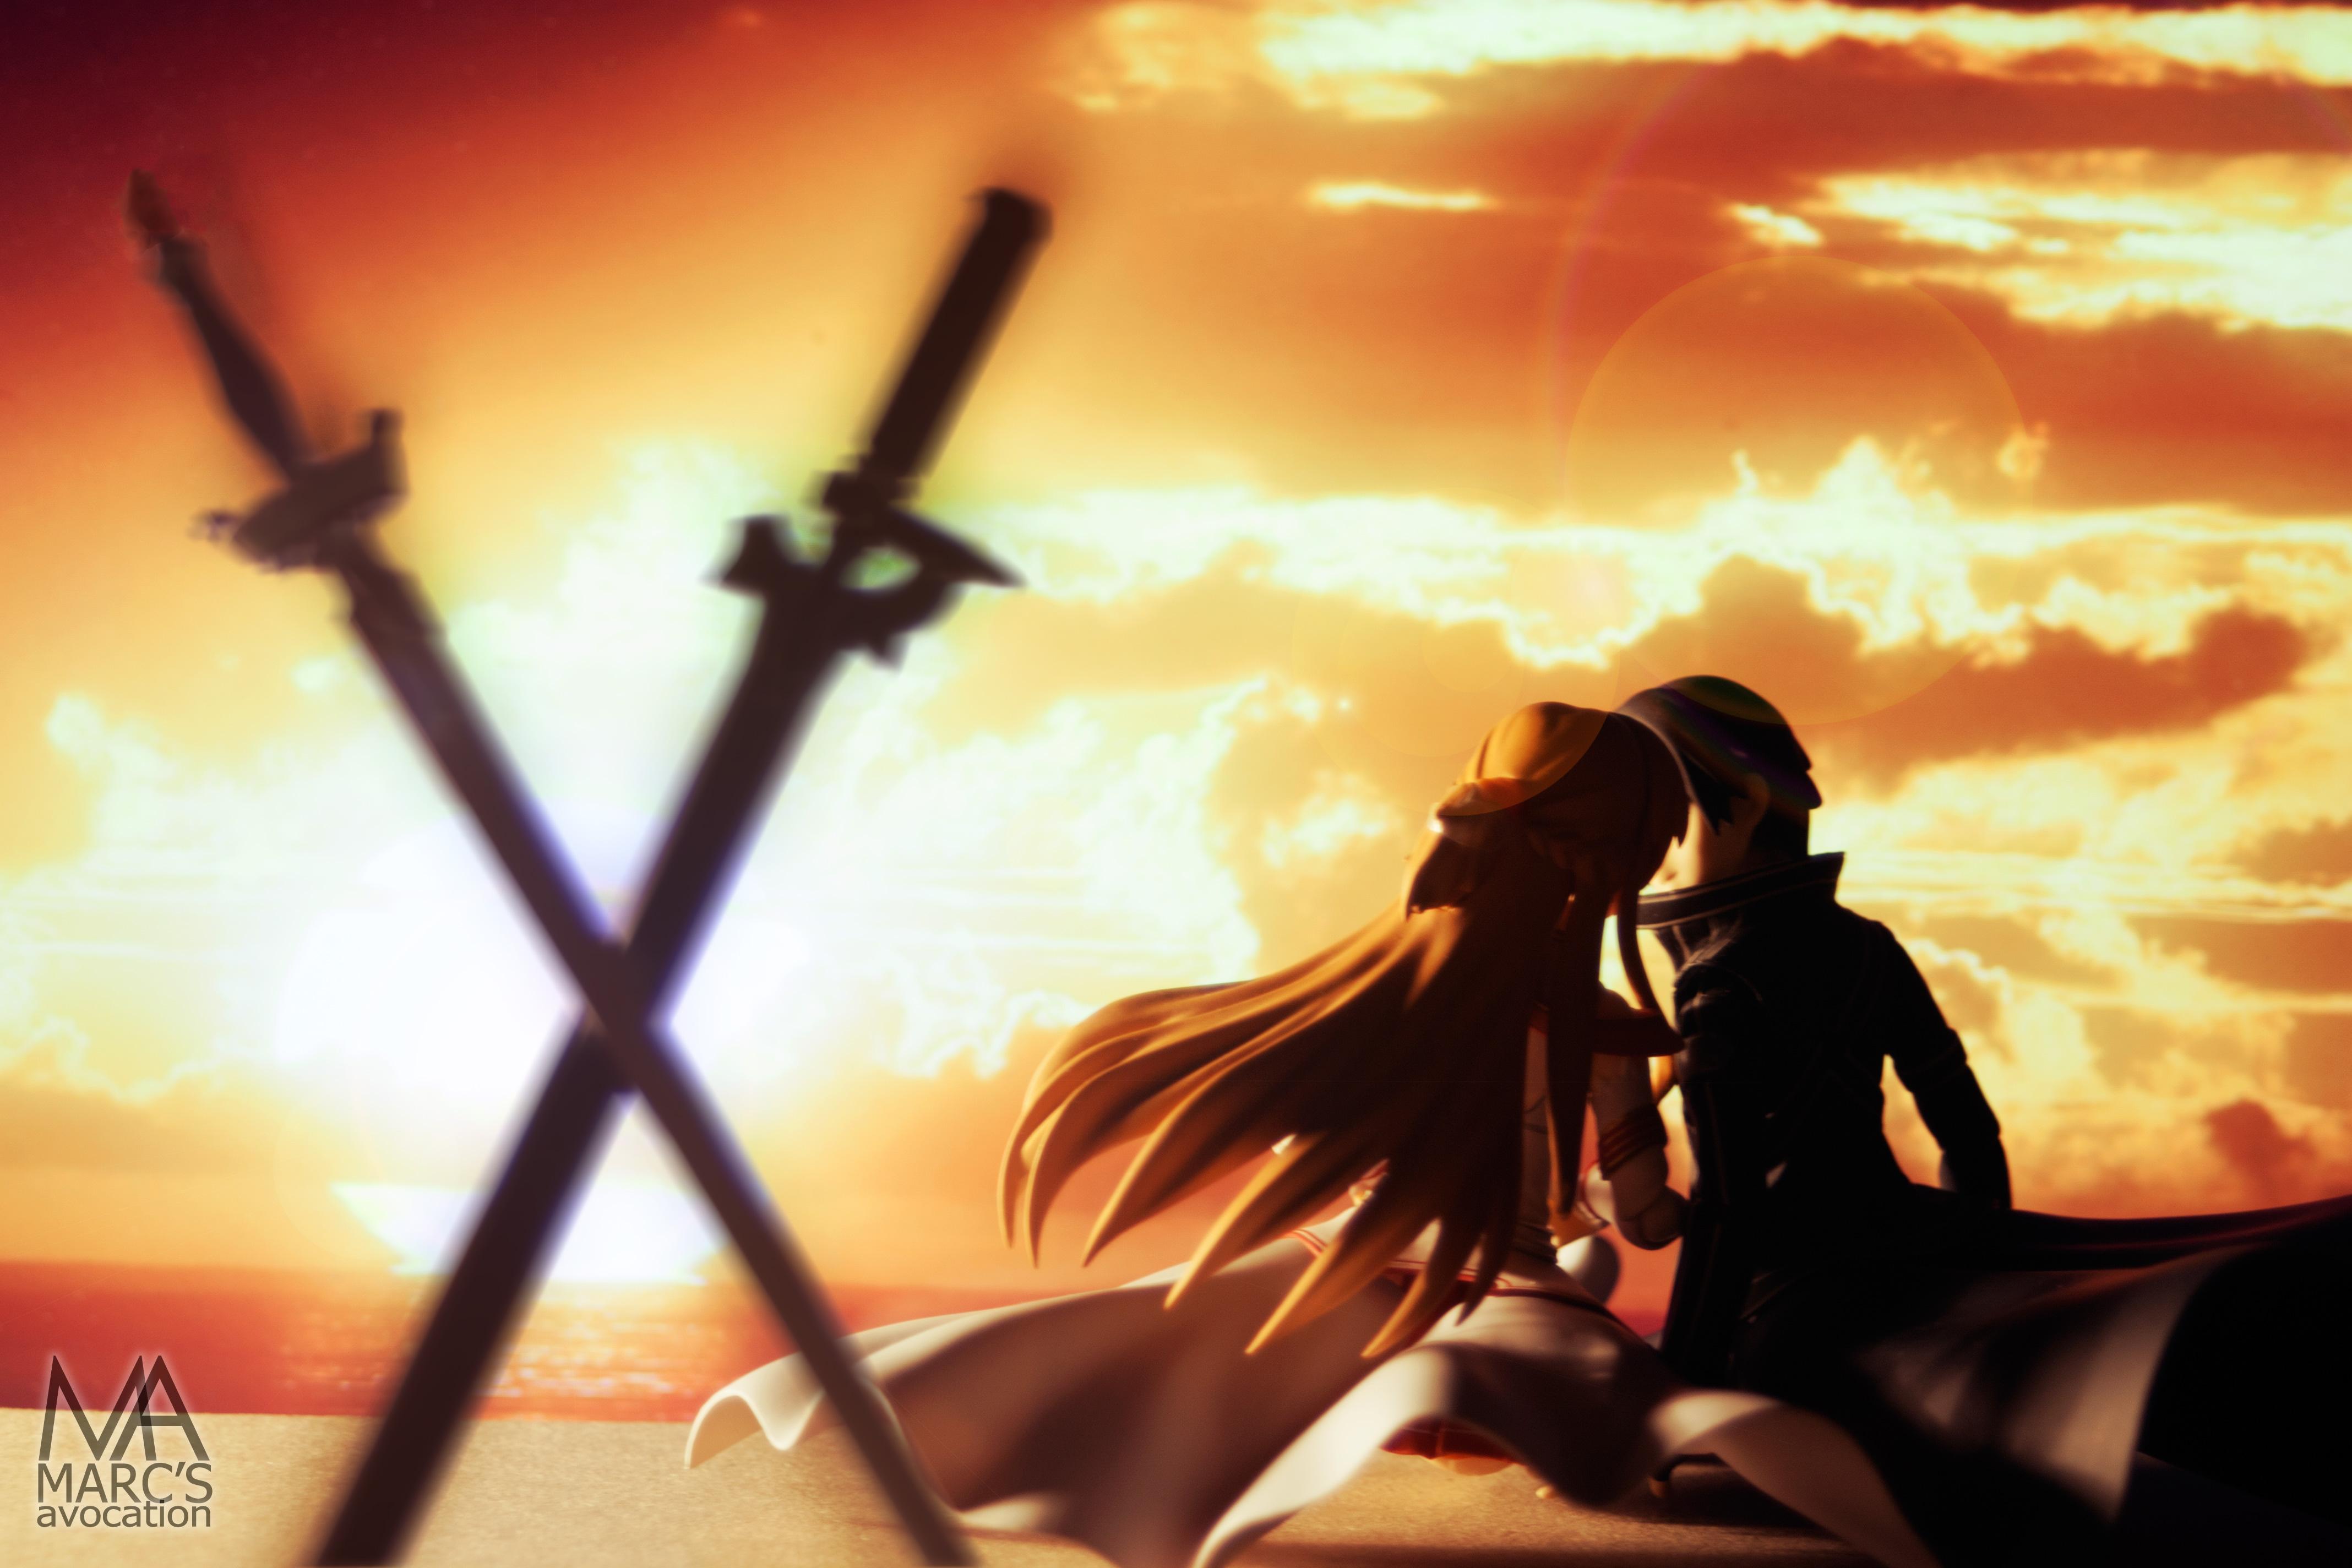 Sword Art Online 4k Ultra Hd Wallpaper Hintergrund 4272x2848